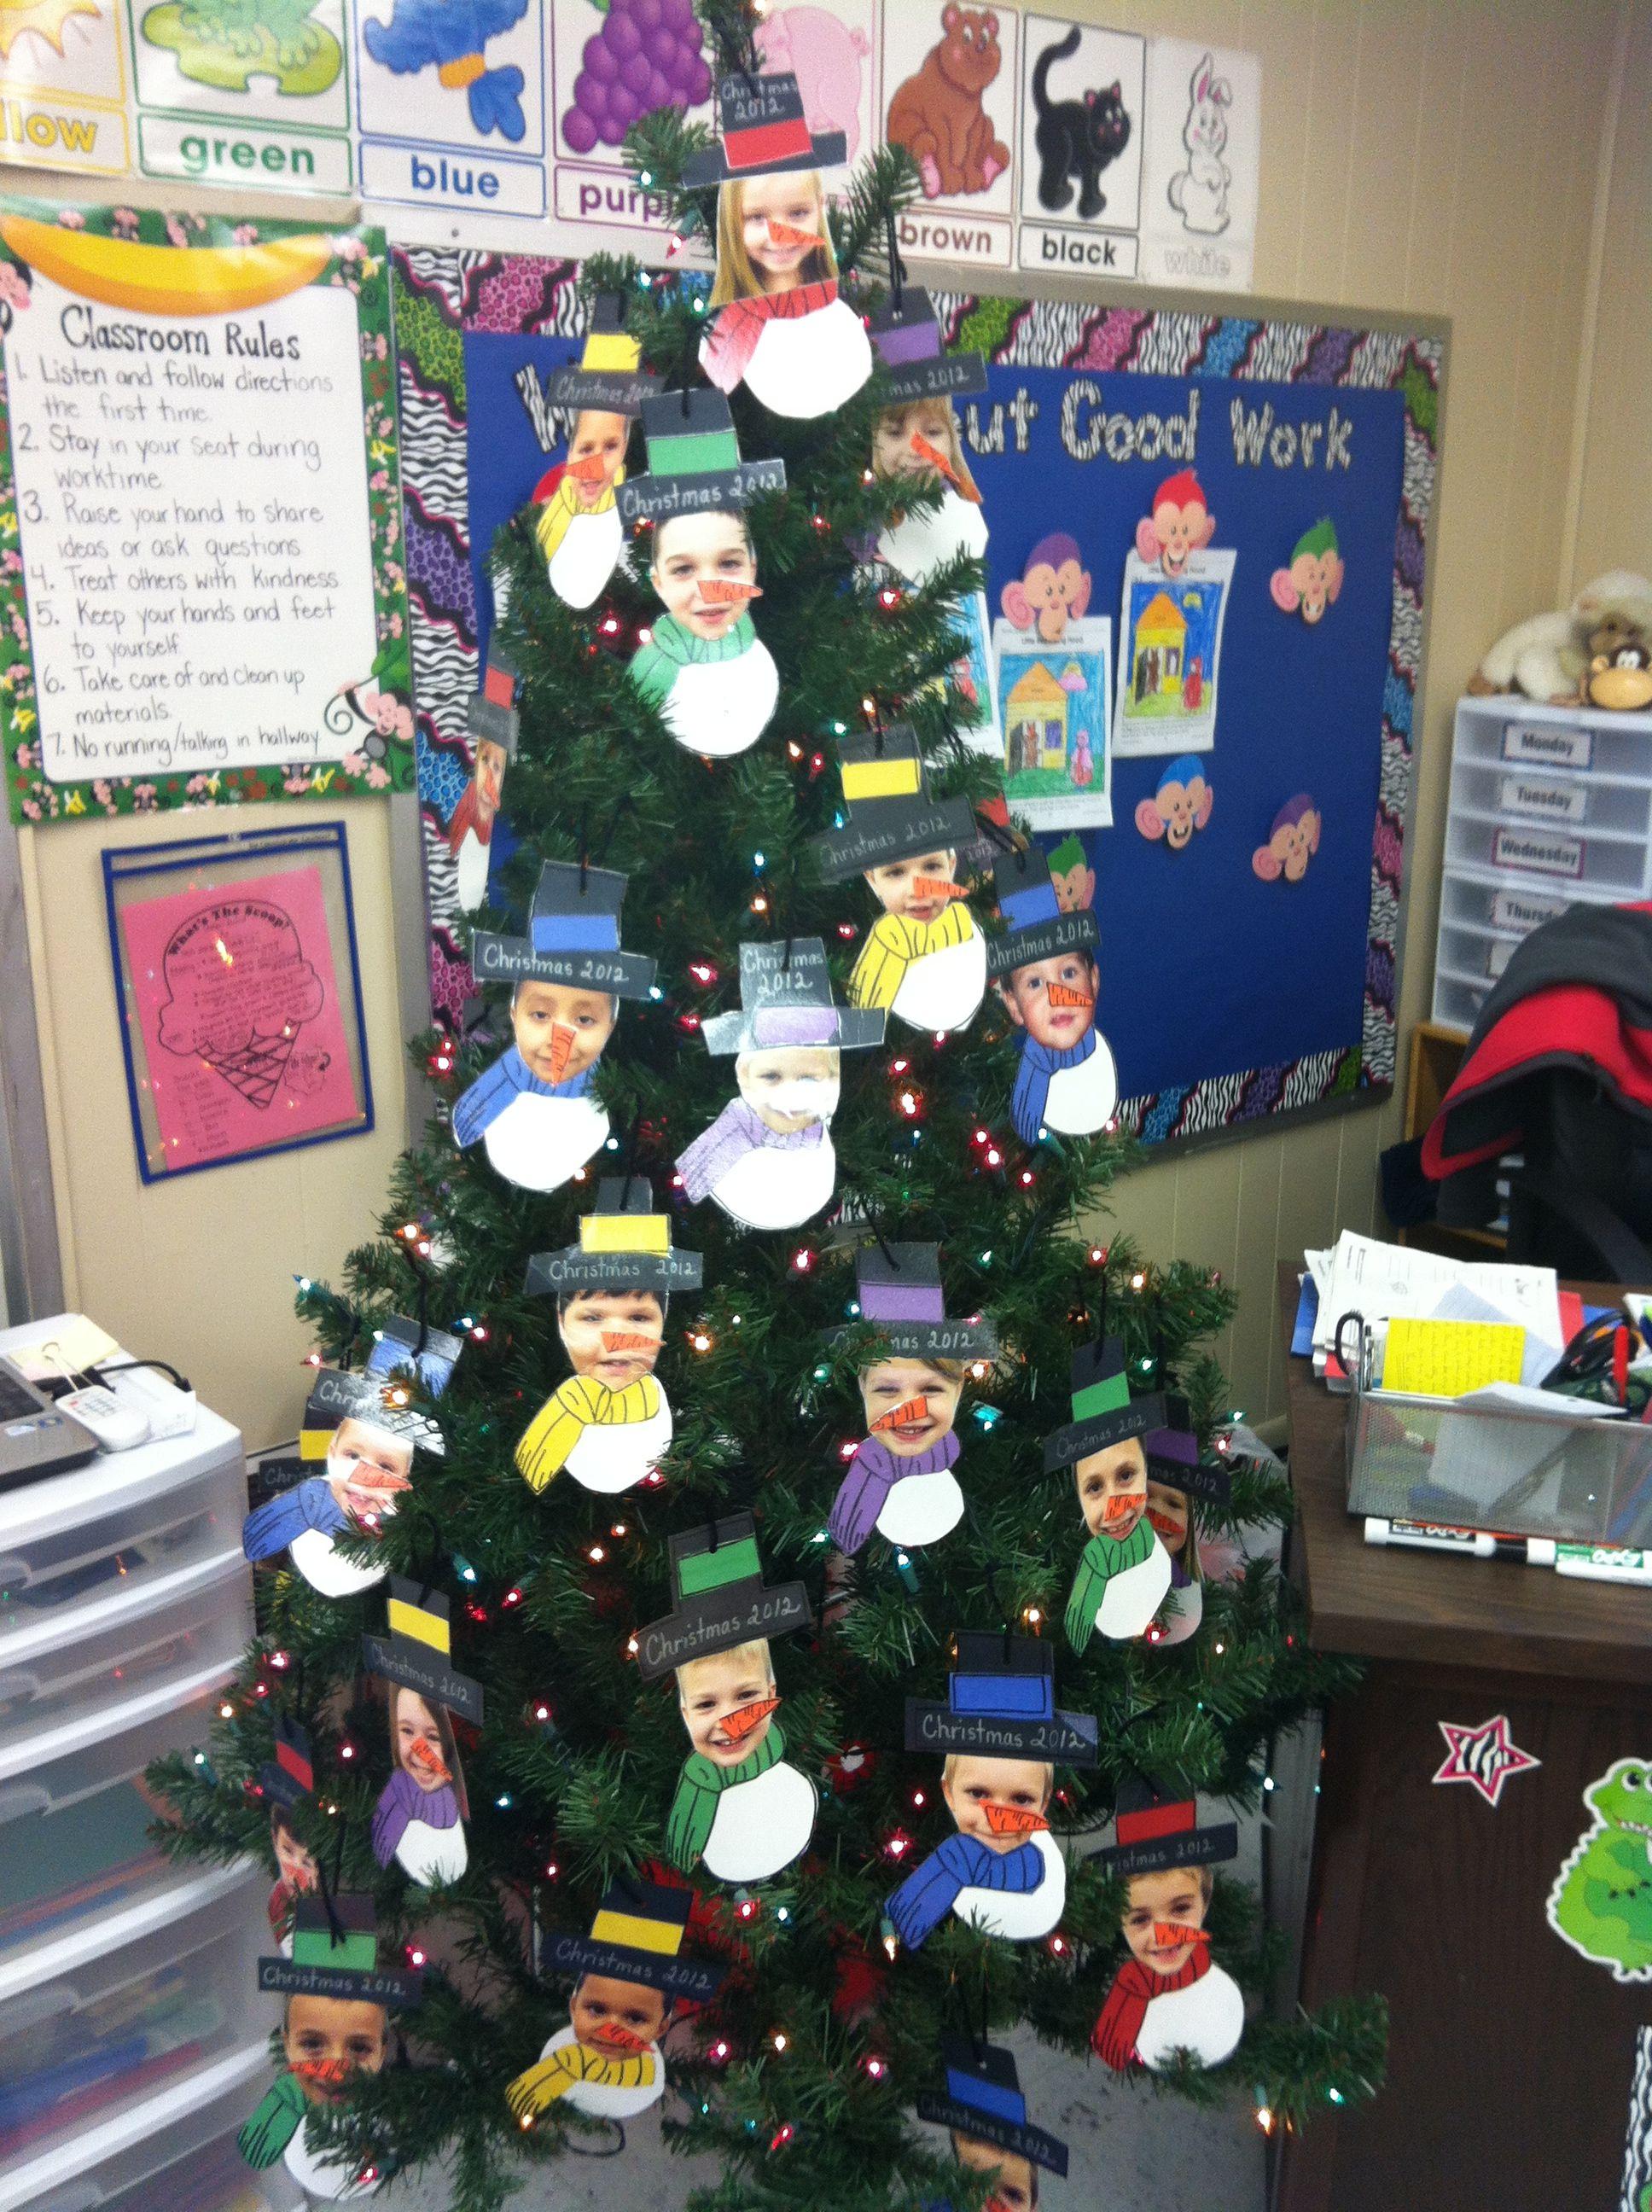 Snowmen Ornaments For The Classroom Christmas Tree I Took A